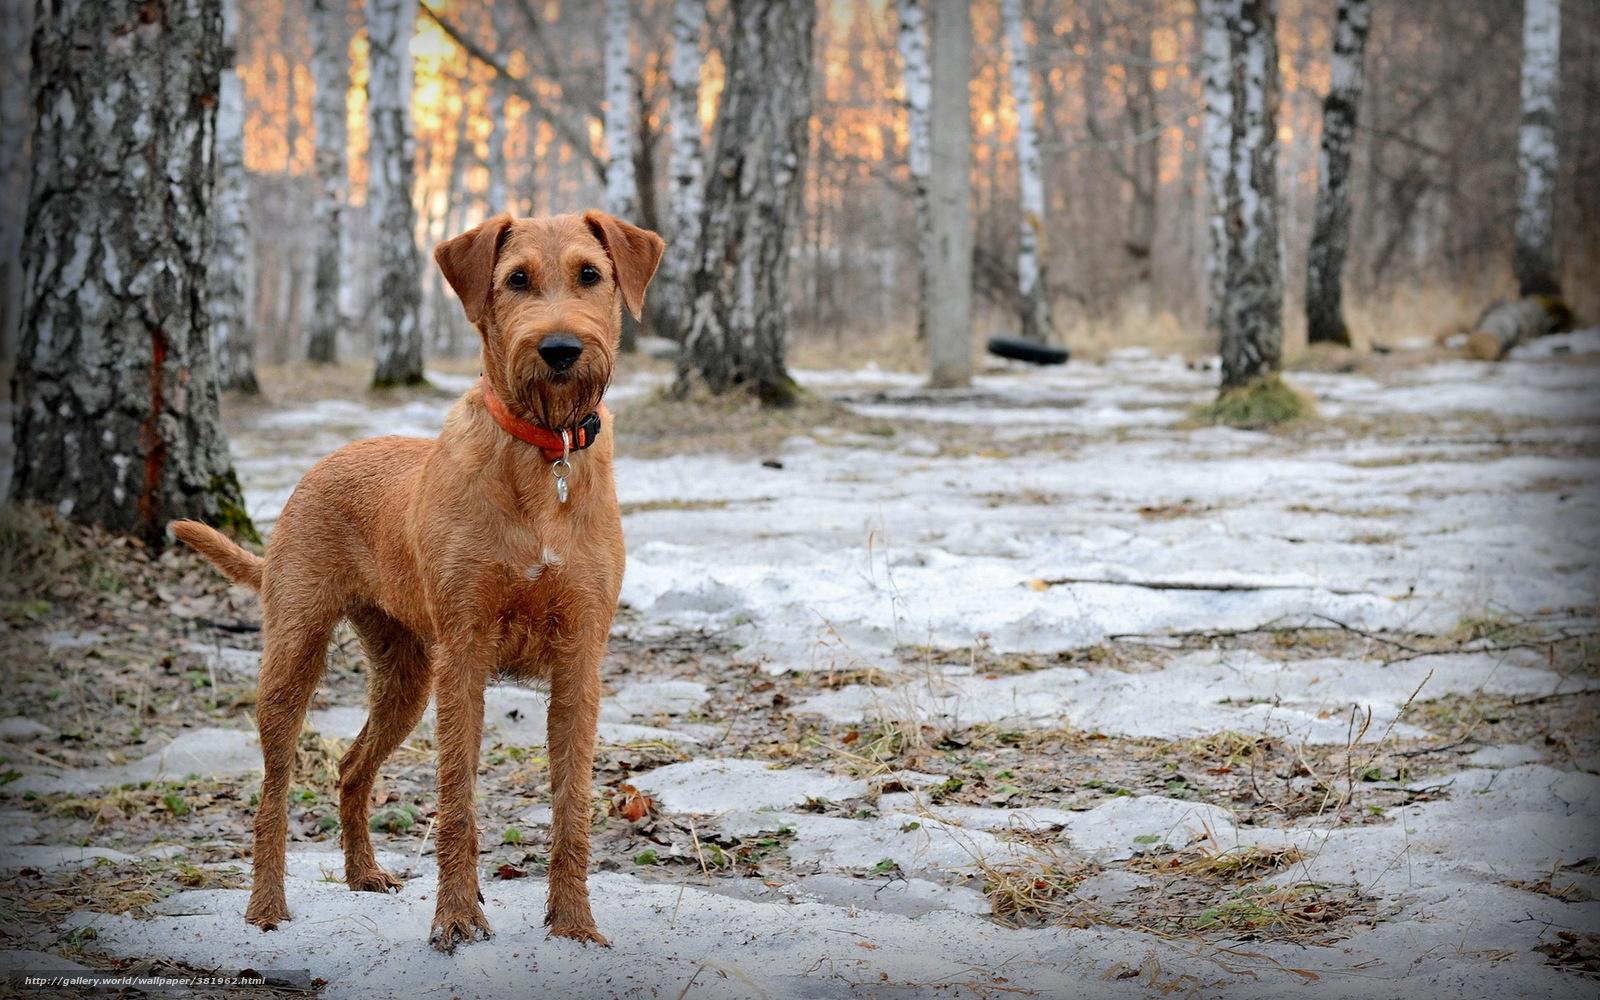 Download wallpaper dog friend forest spring desktop wallpaper 1600x1000